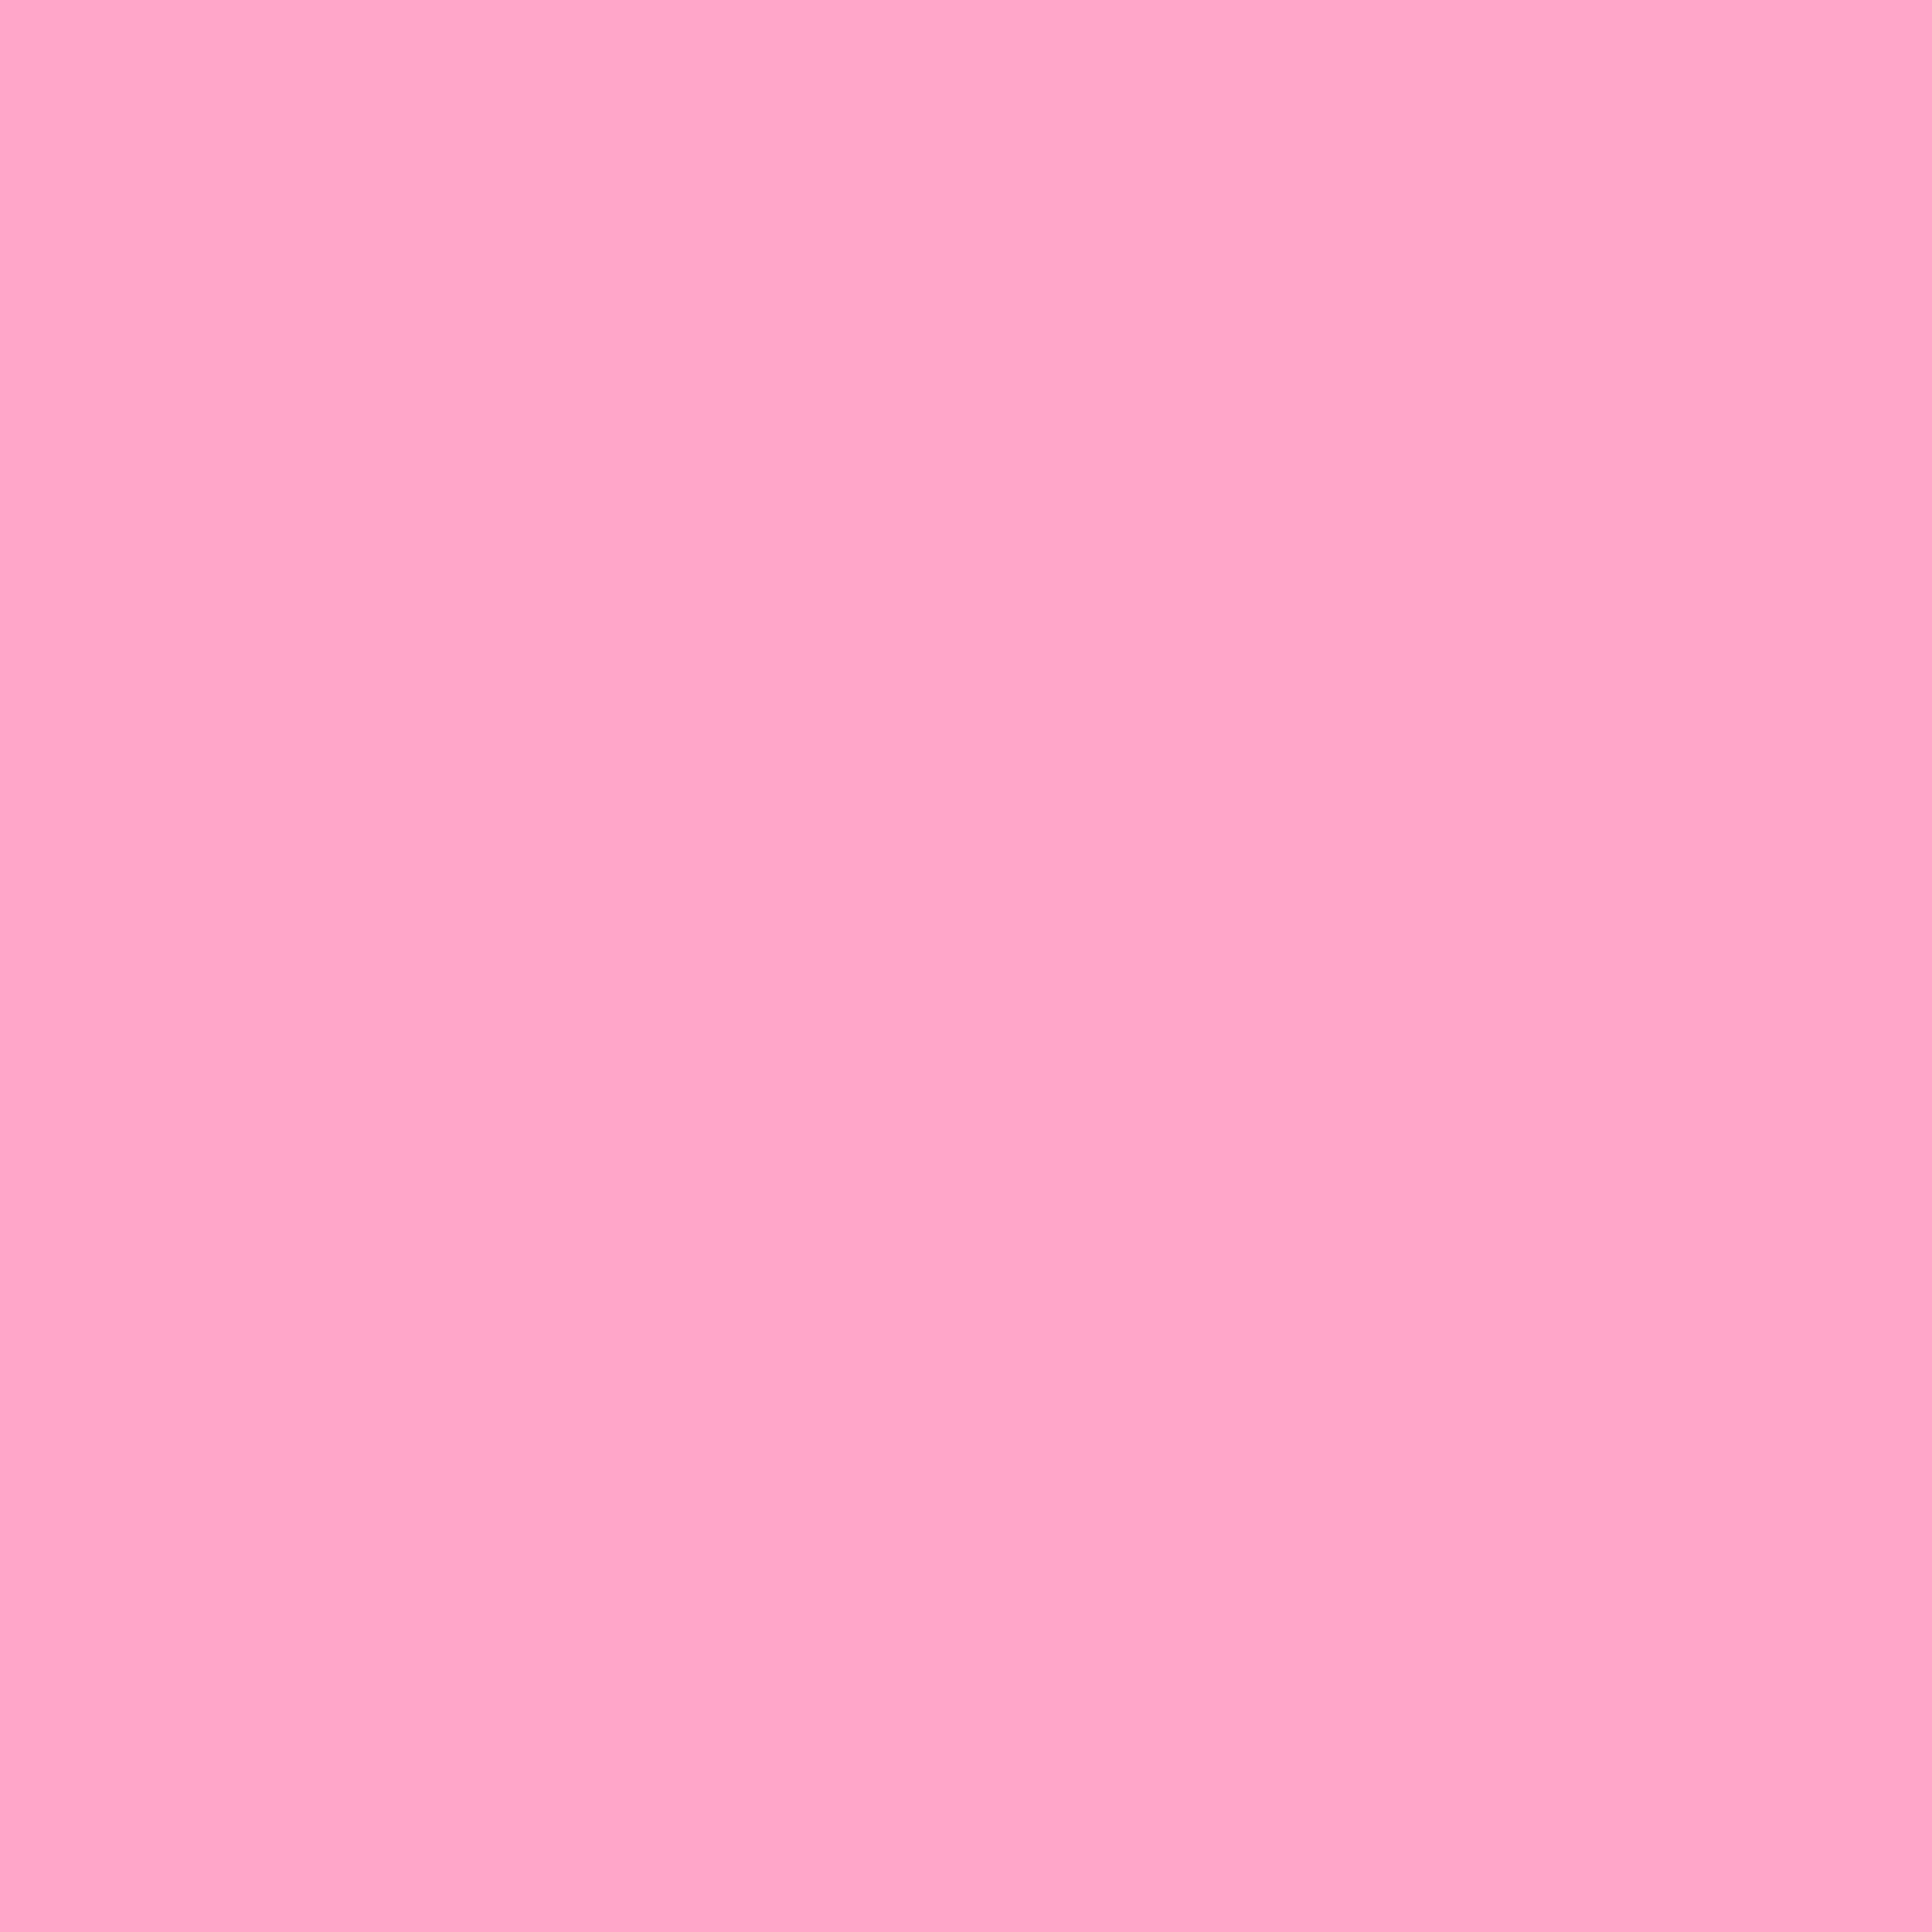 2732x2732 Carnation Pink Solid Color Background